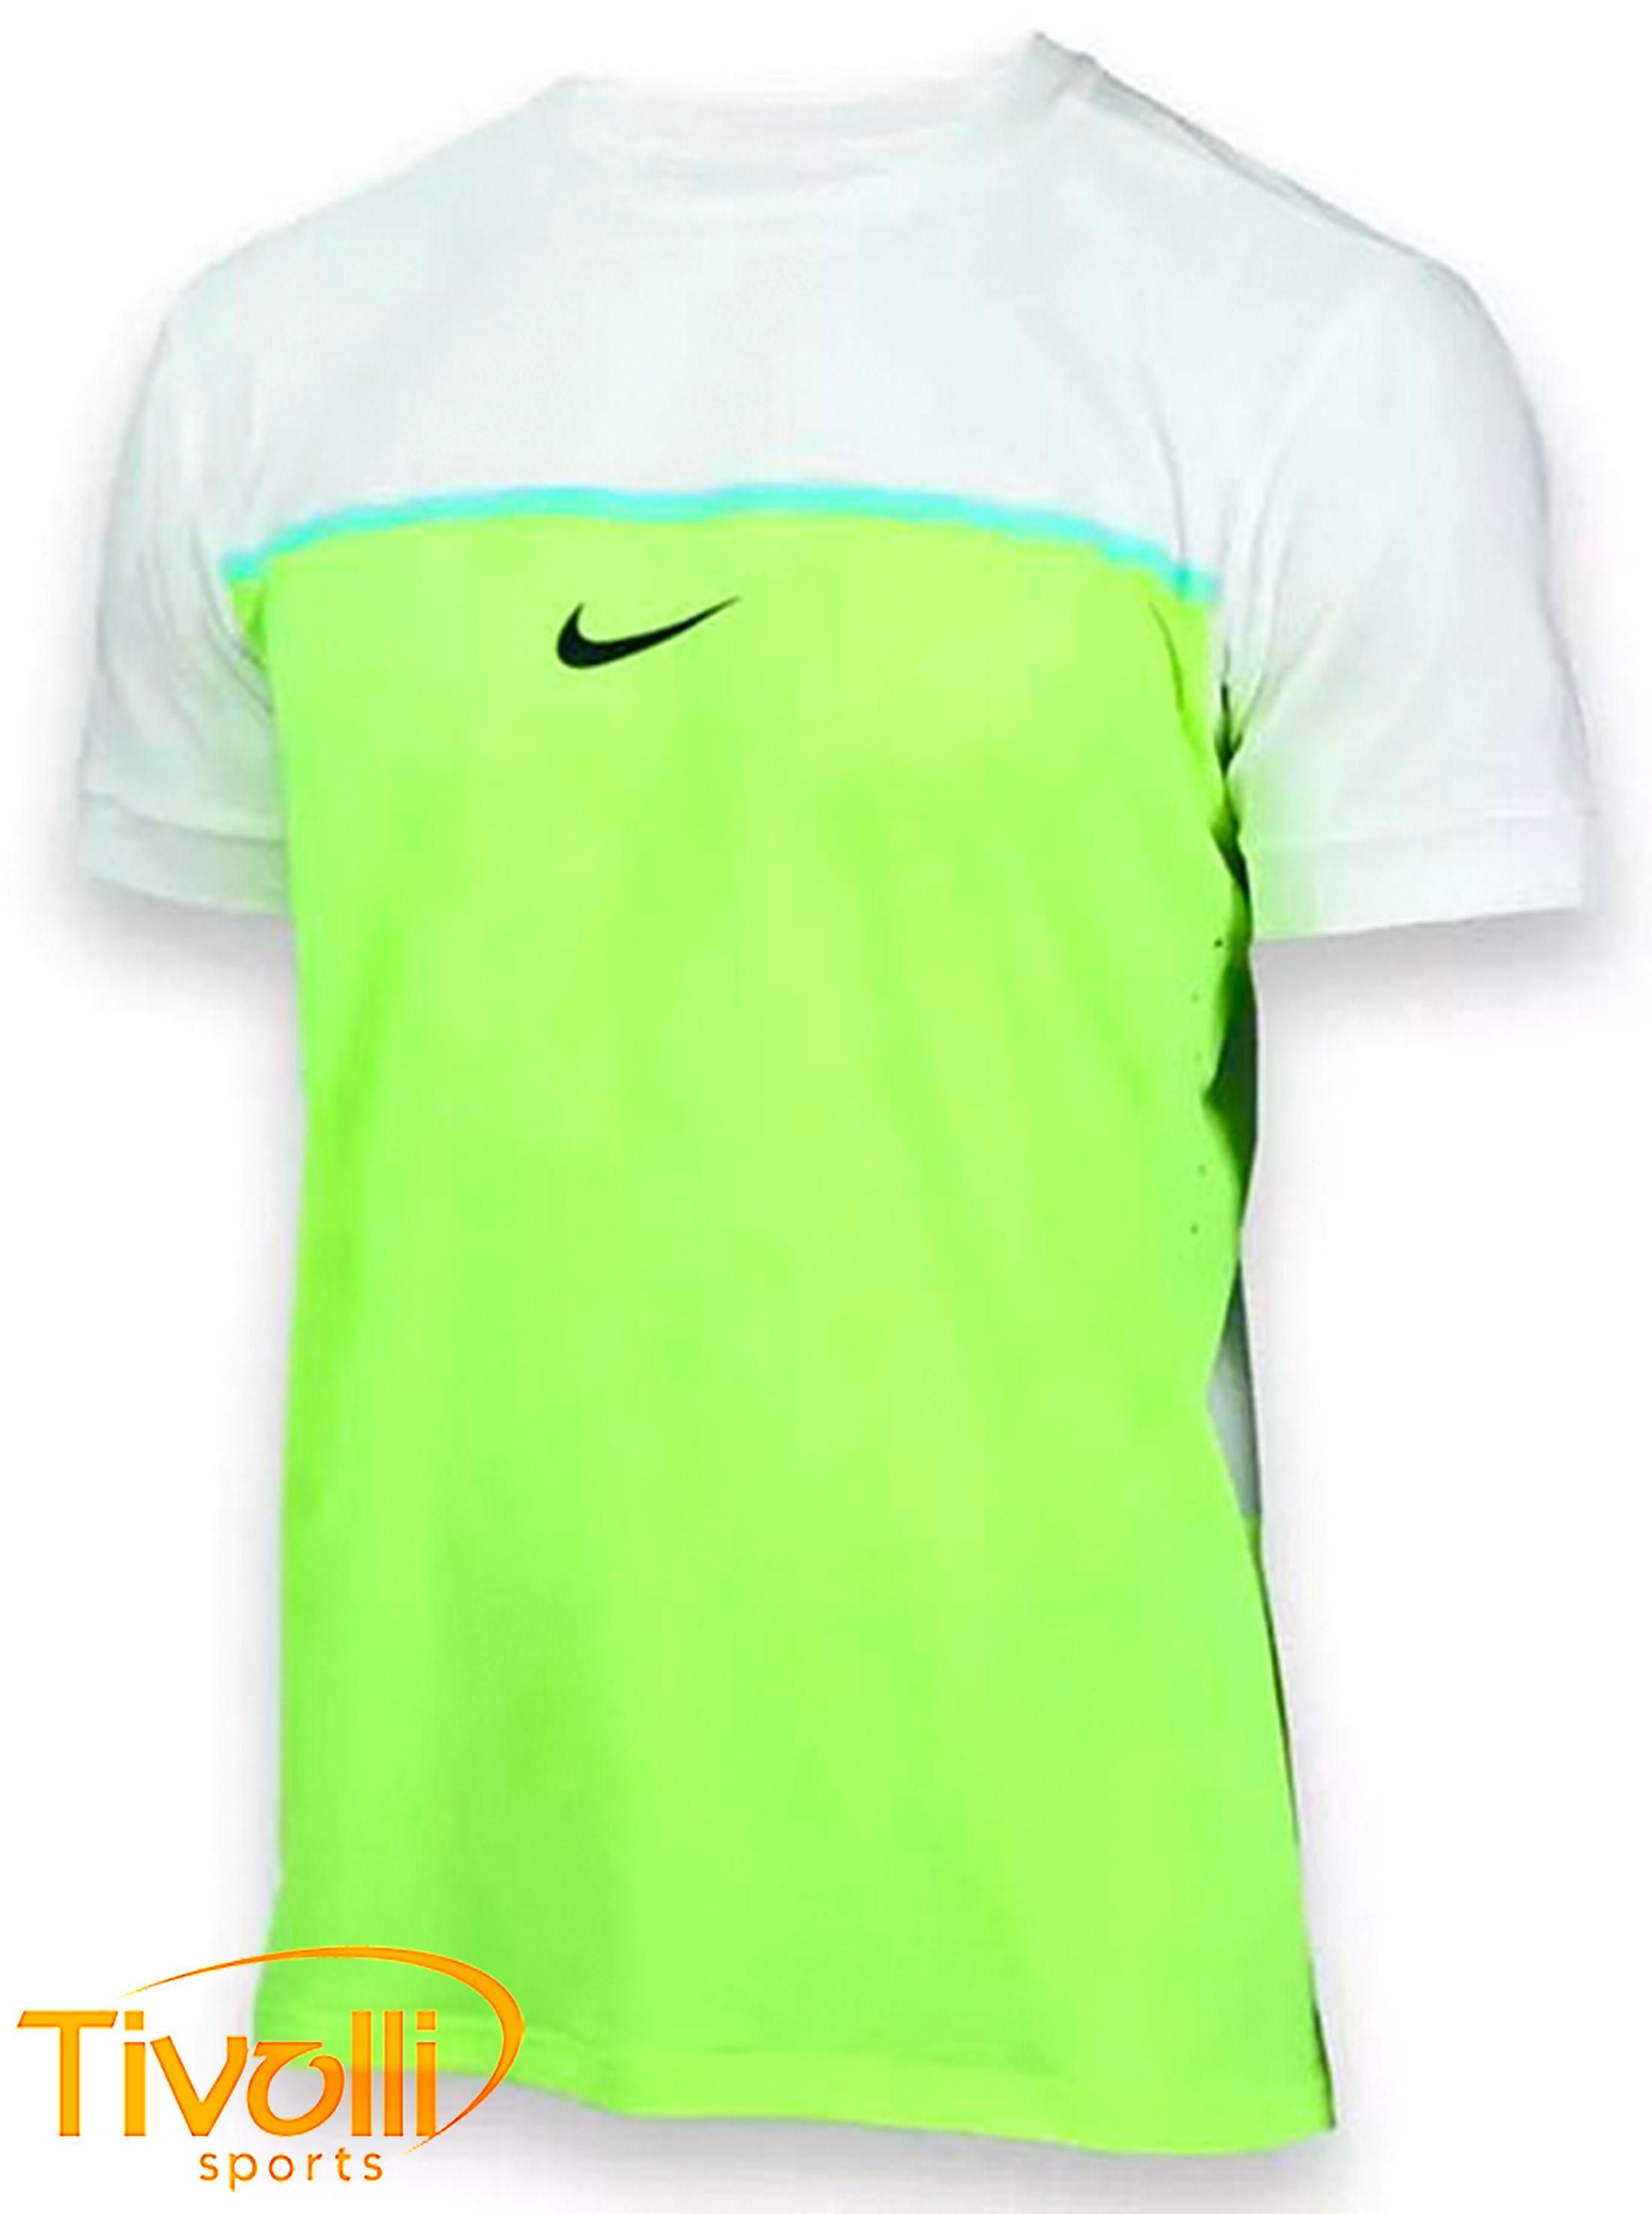 bef8502d6c Camiseta Nike Challenger Premier Rafa Crew masculina verde limão e branca - Rafael  Nadal